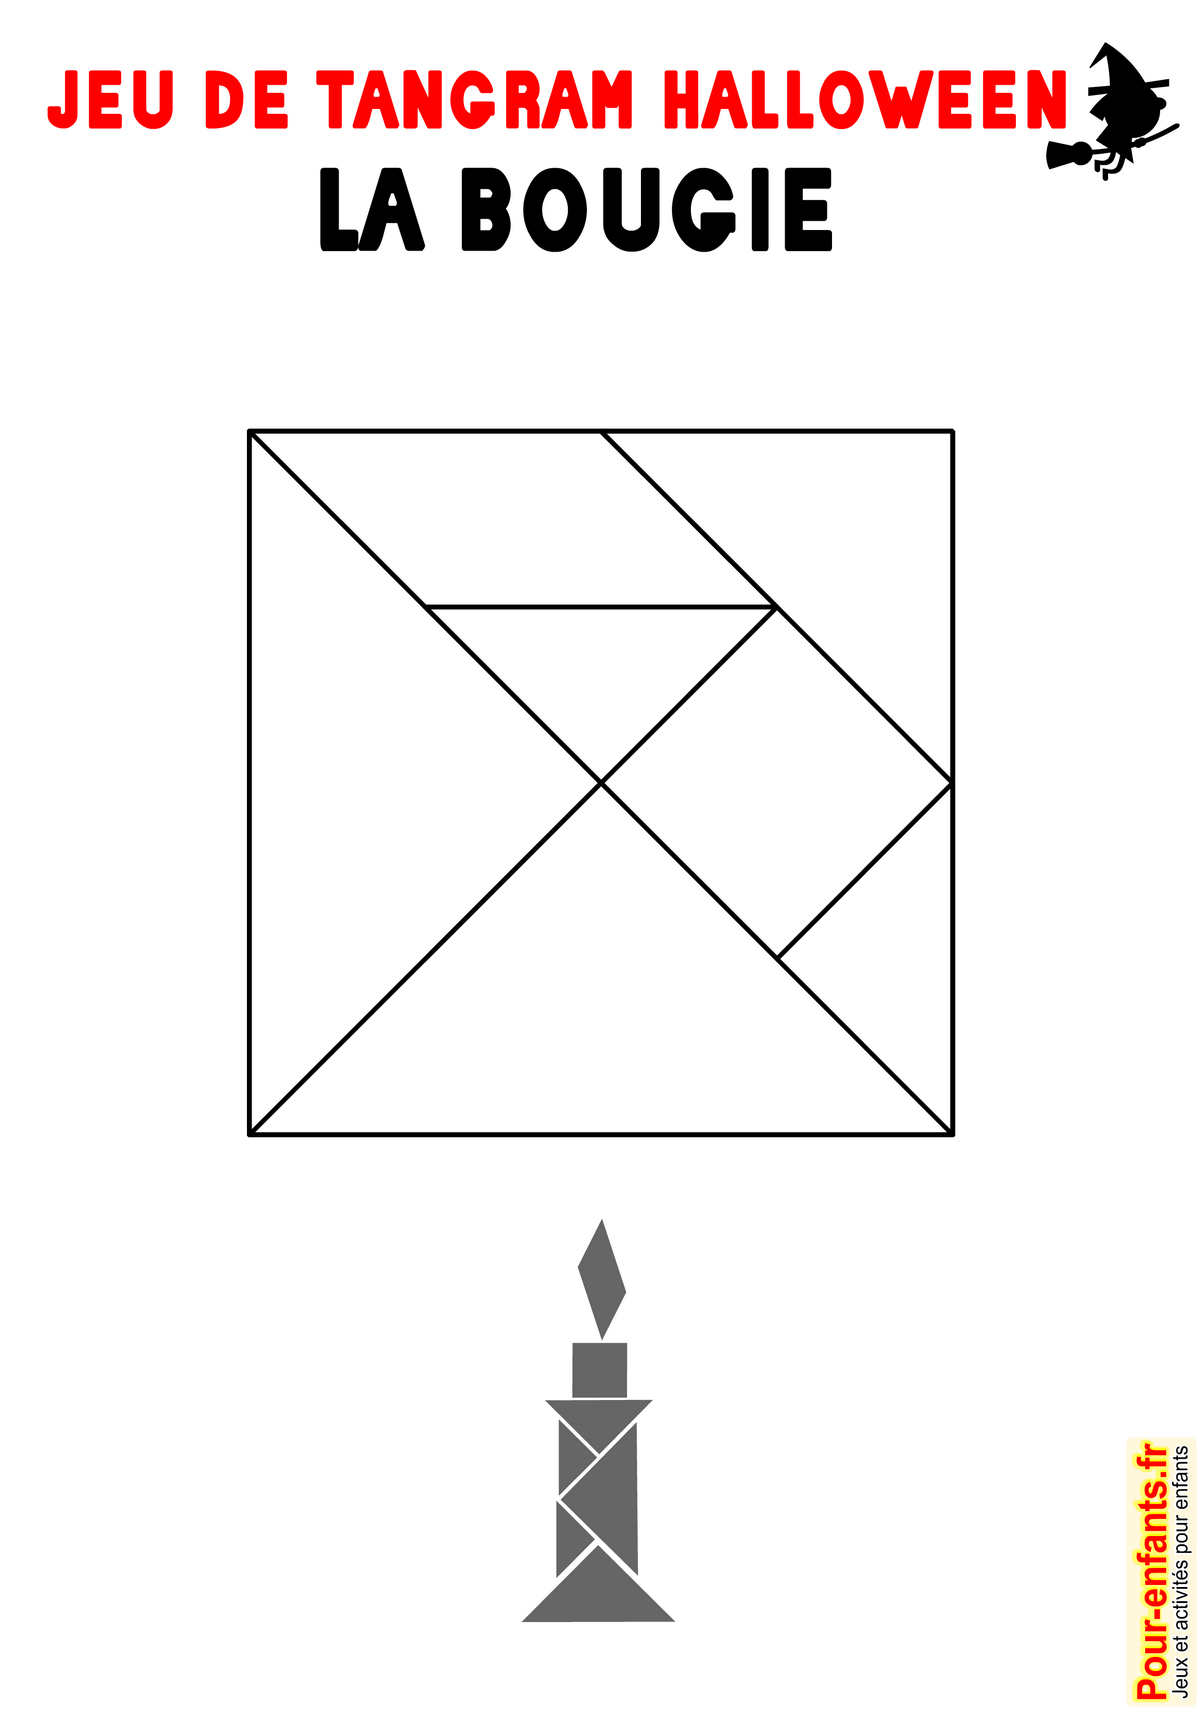 Jeu De Tangram À Imprimer Bougie Halloween Imprimable concernant Modèle Tangram À Imprimer